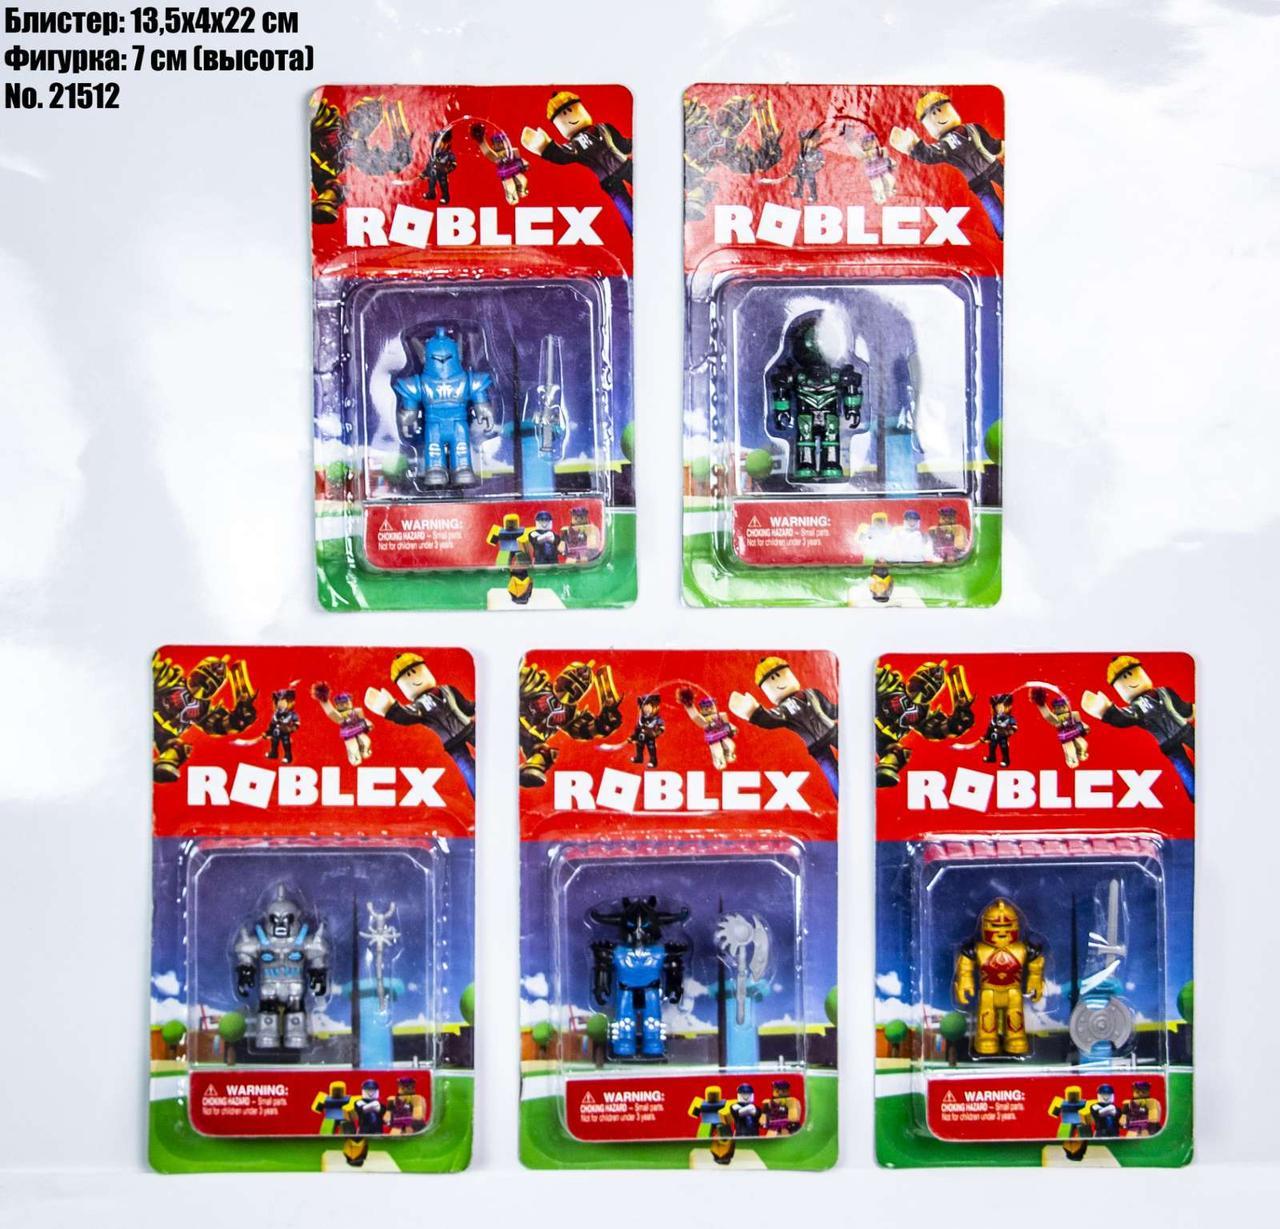 Фигурки Roblox в блистере